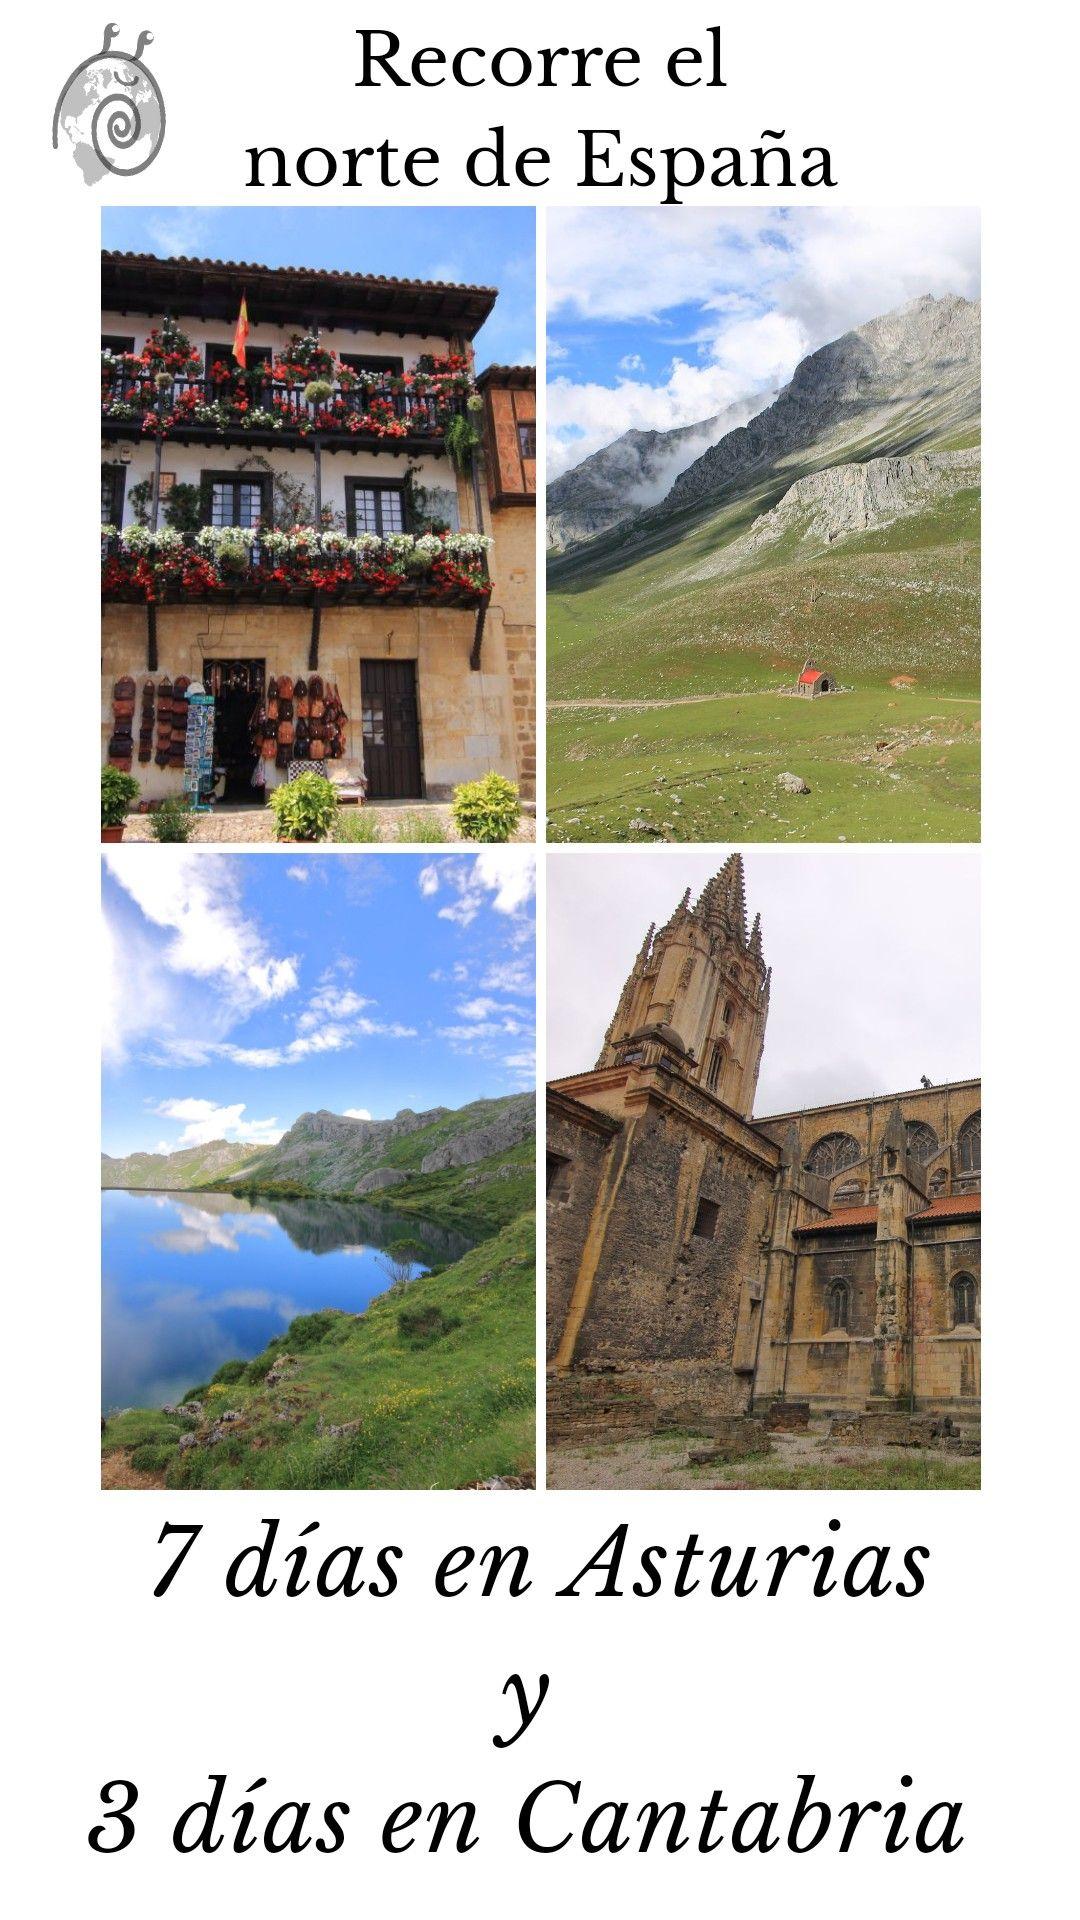 3 Días En Cantabria Y 7 En Asturias Precios E Itinerario Detallado España Asturias Cantab Viajes España Baratos España Lugares Turisticos Viajar Por España